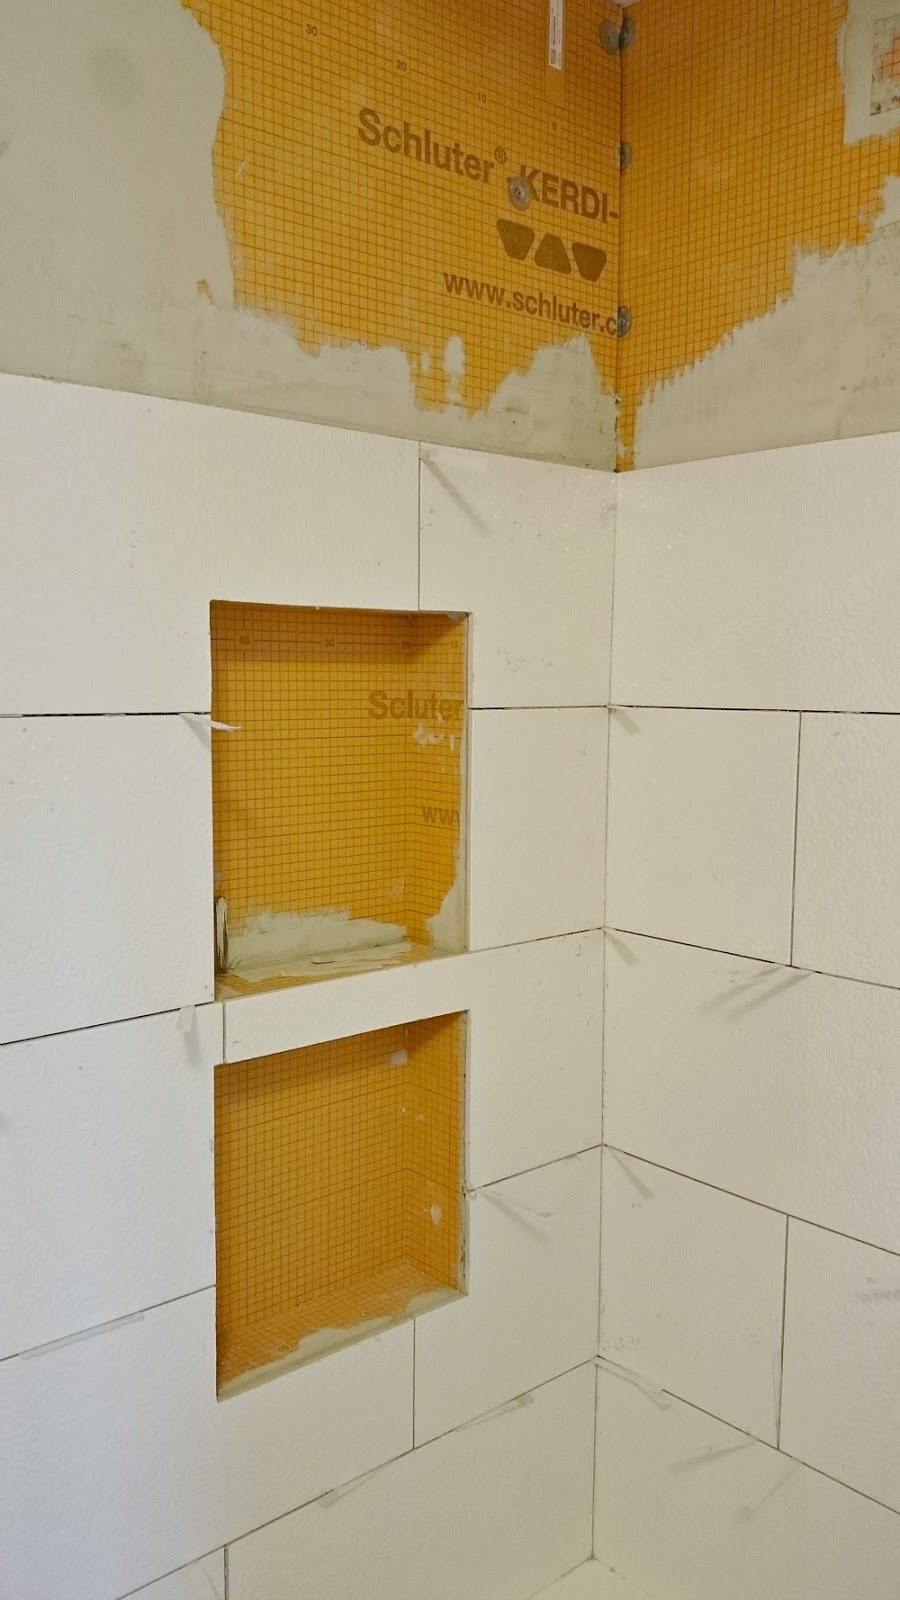 Installing tile with Schluter Kerdi backing